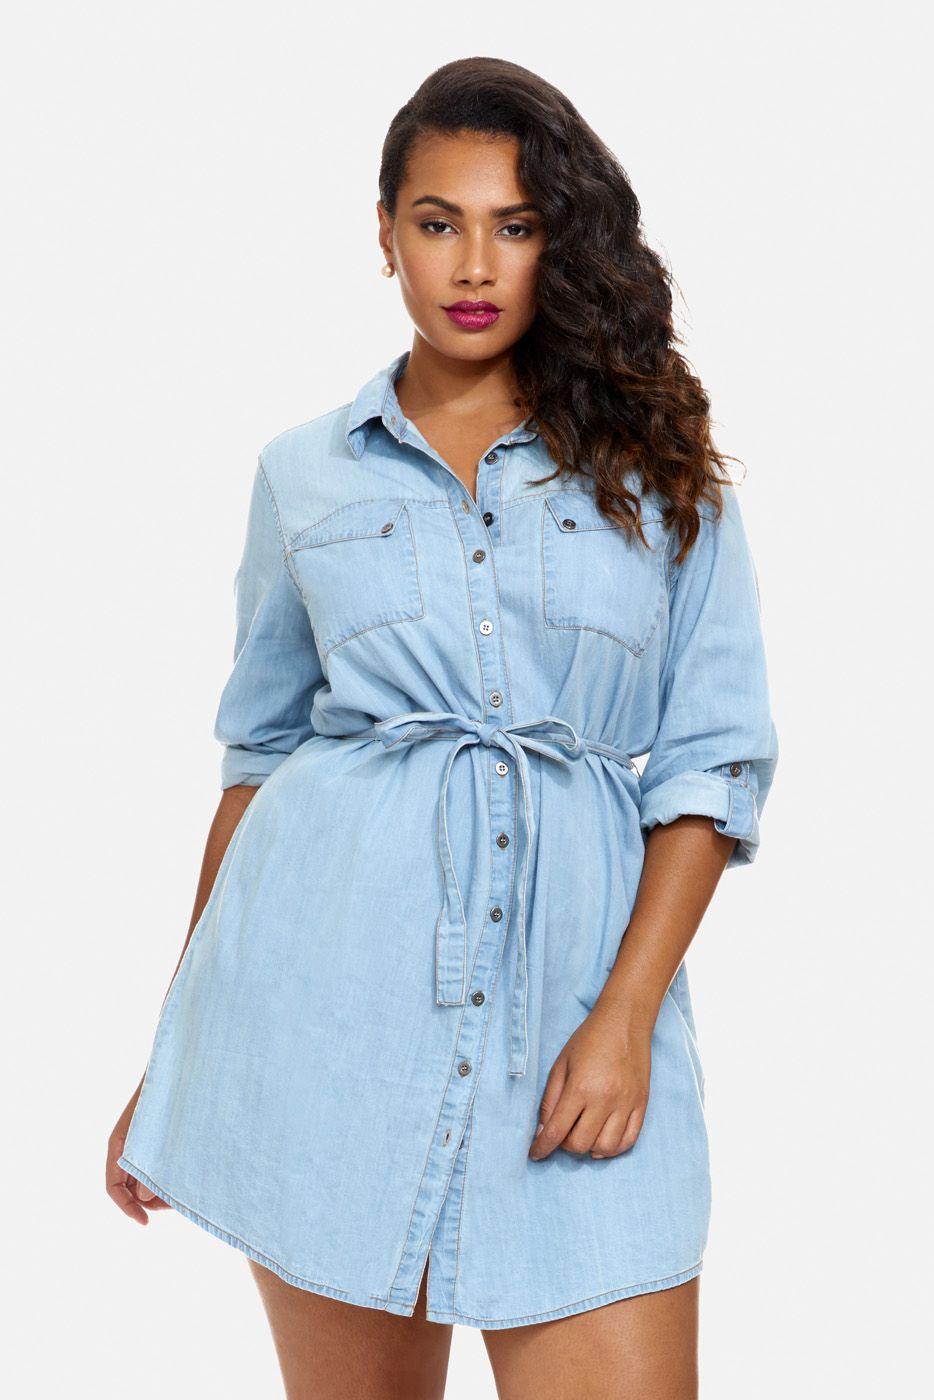 Plus Size Sophie Long Sleeve Denim Shirt Dress Fashiontofigure